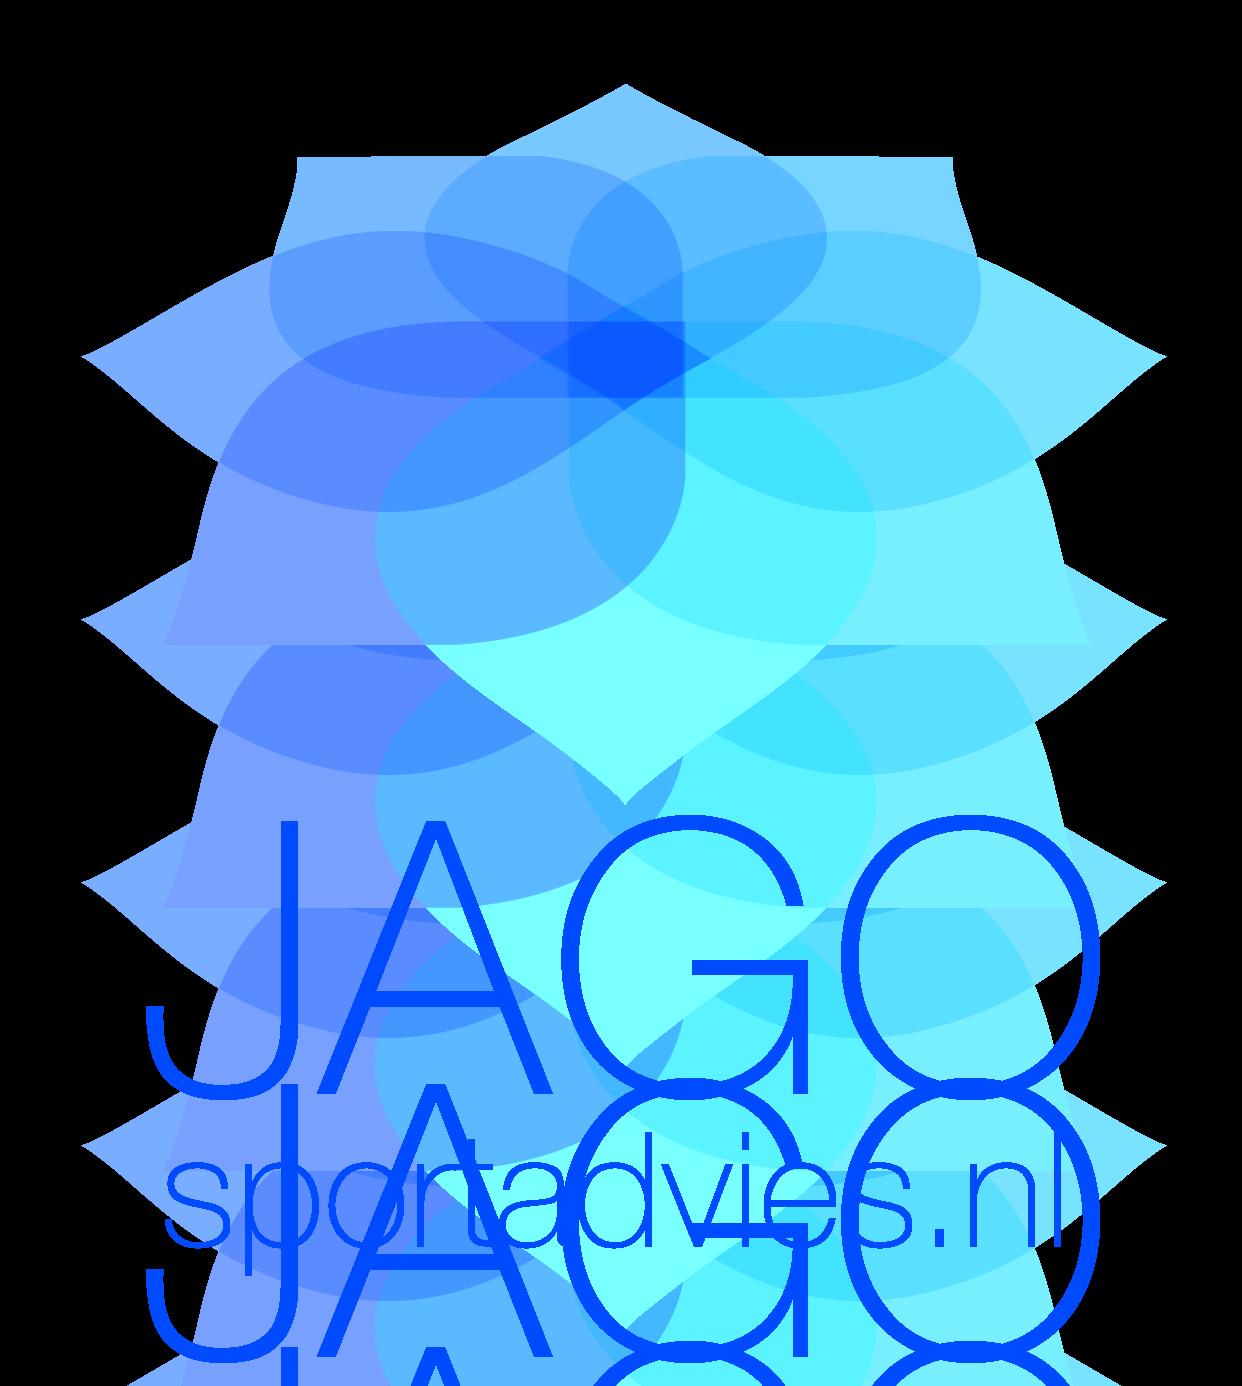 Race clipart fitnessgram. Hello world jago sportadvies